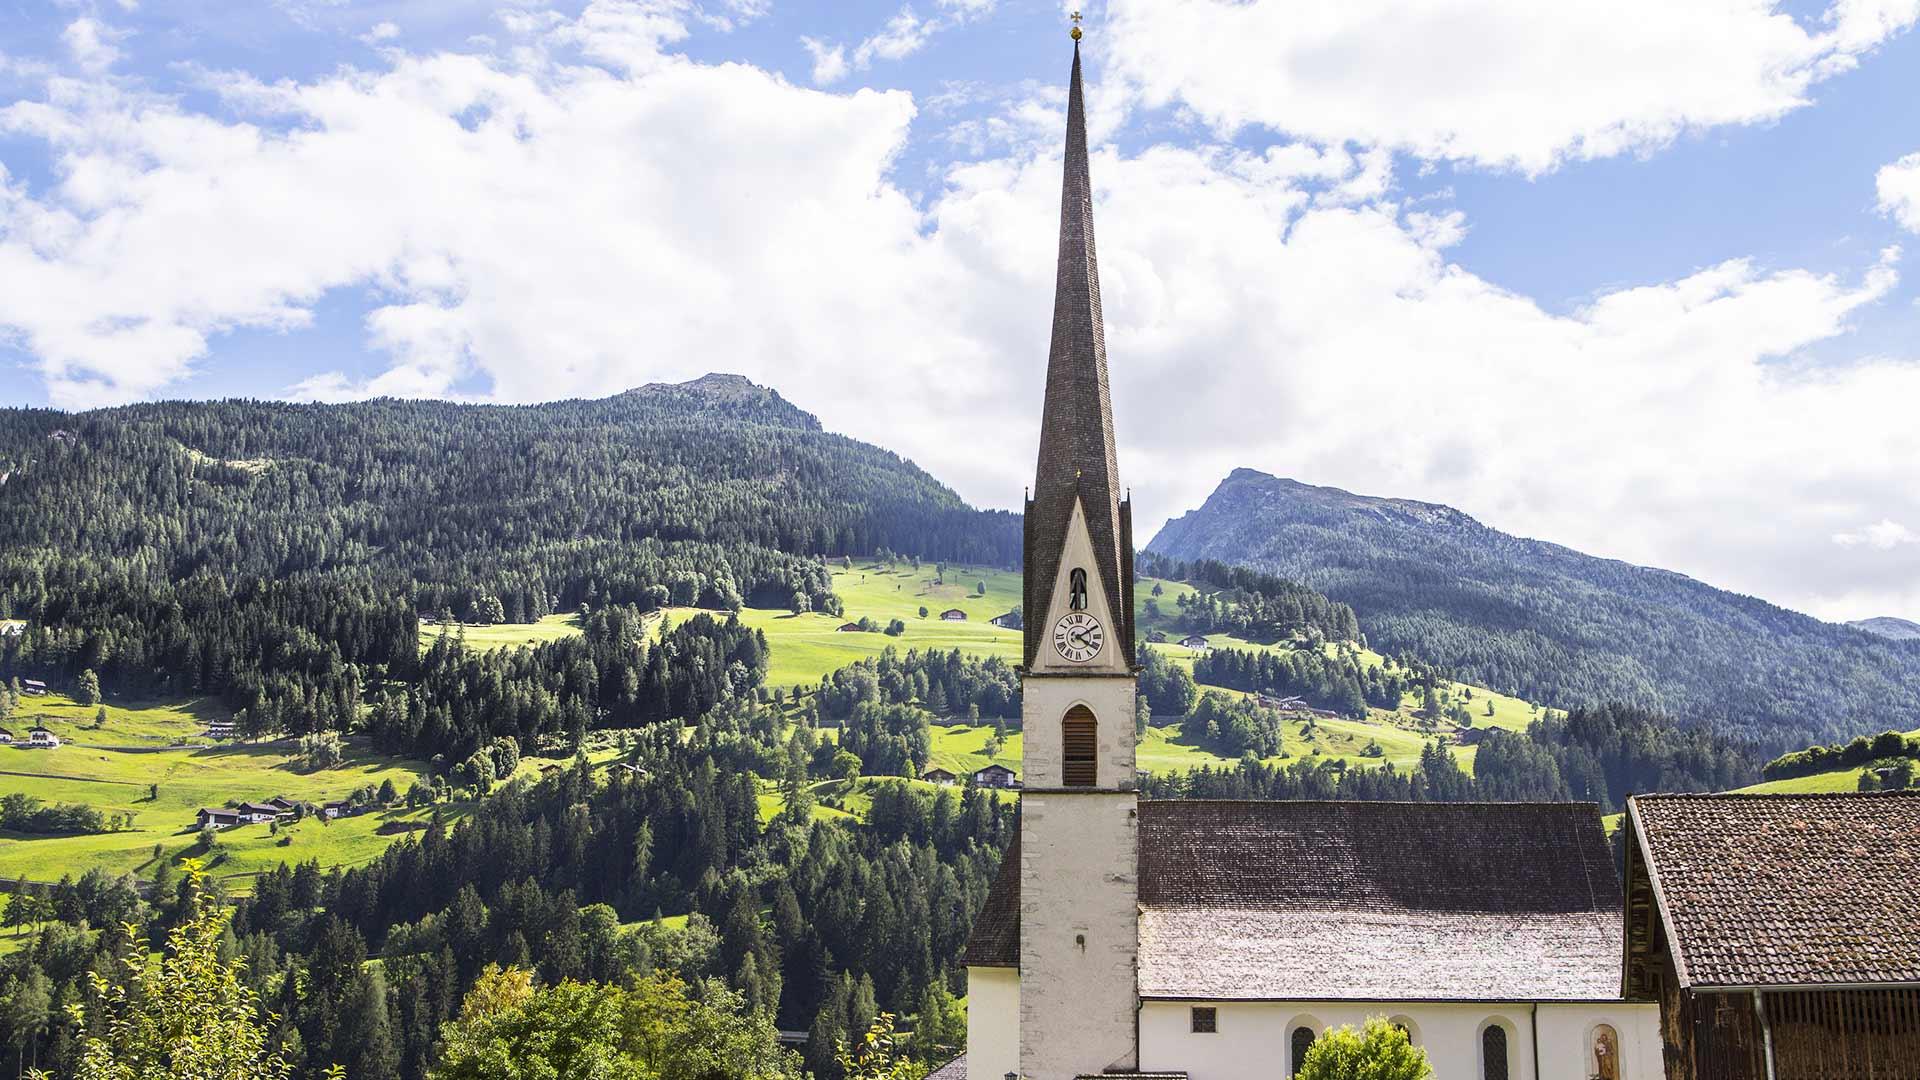 Pfarrkirche Maria Himmelfahrt in Moos, Südtirol